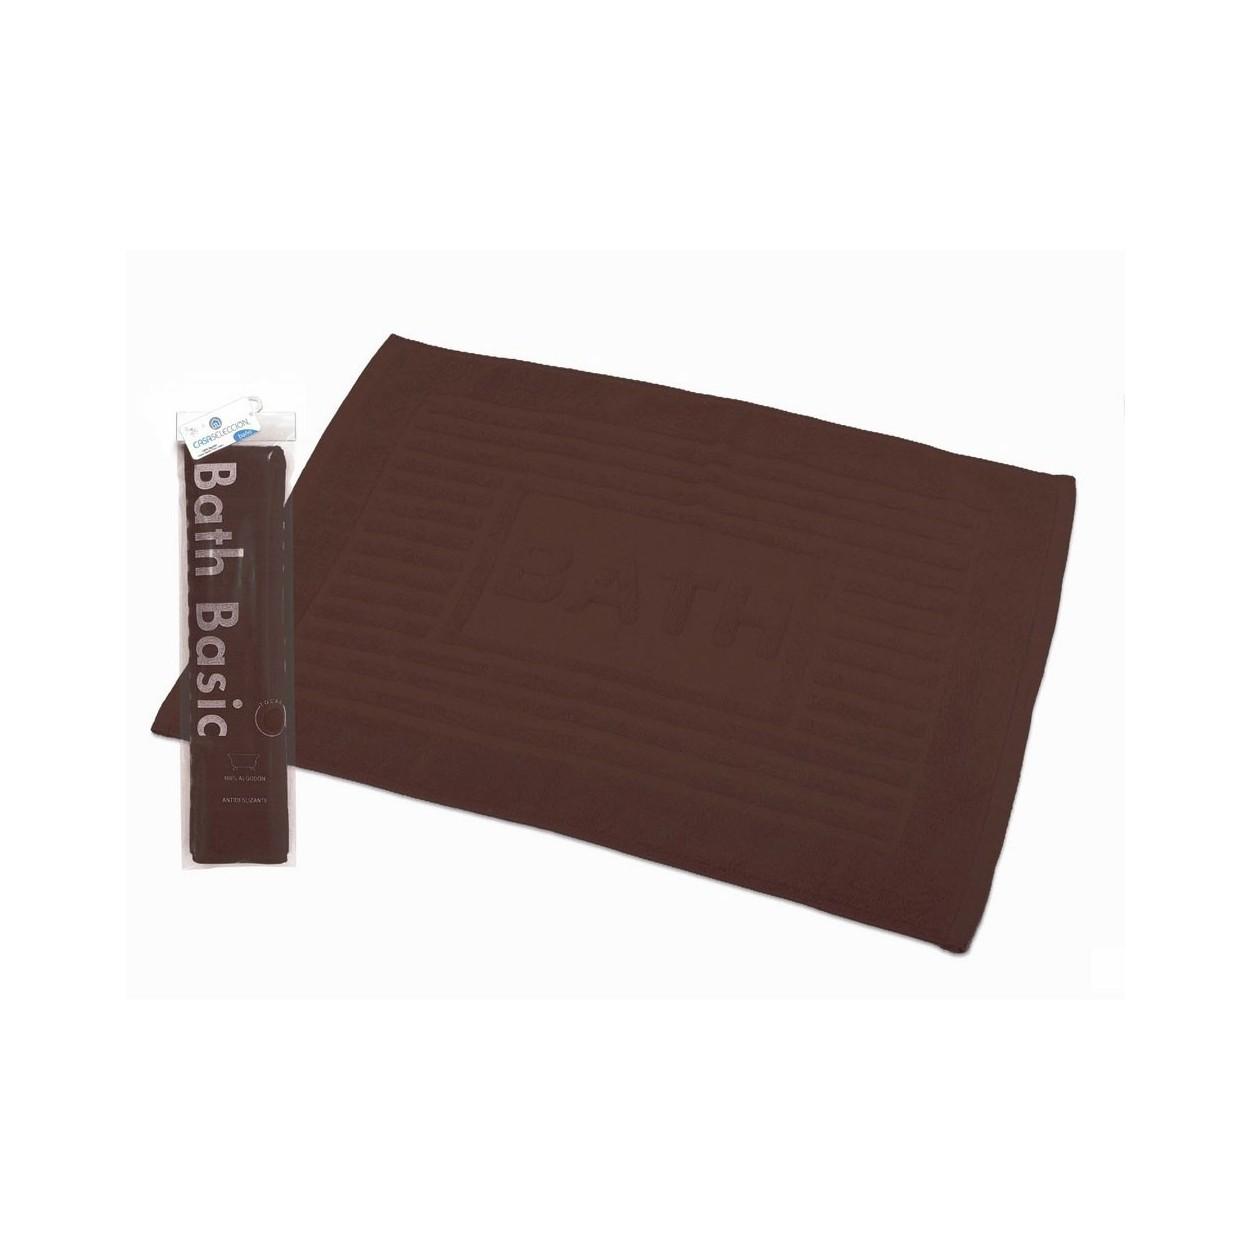 Alfombra para ba o rectangular de algod n y rizo - Pared marron chocolate ...